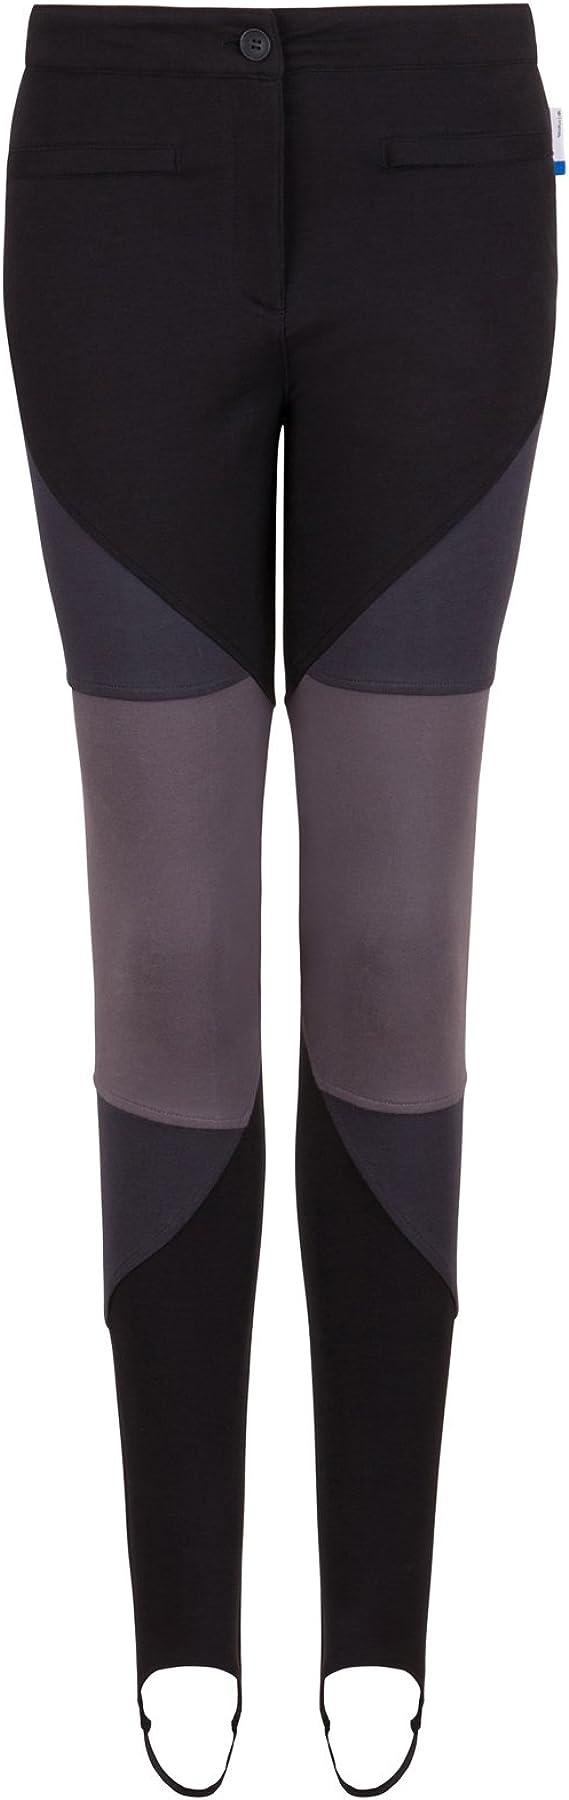 adidas Originals - Pantalones de chándal para Mujer - Producto ...